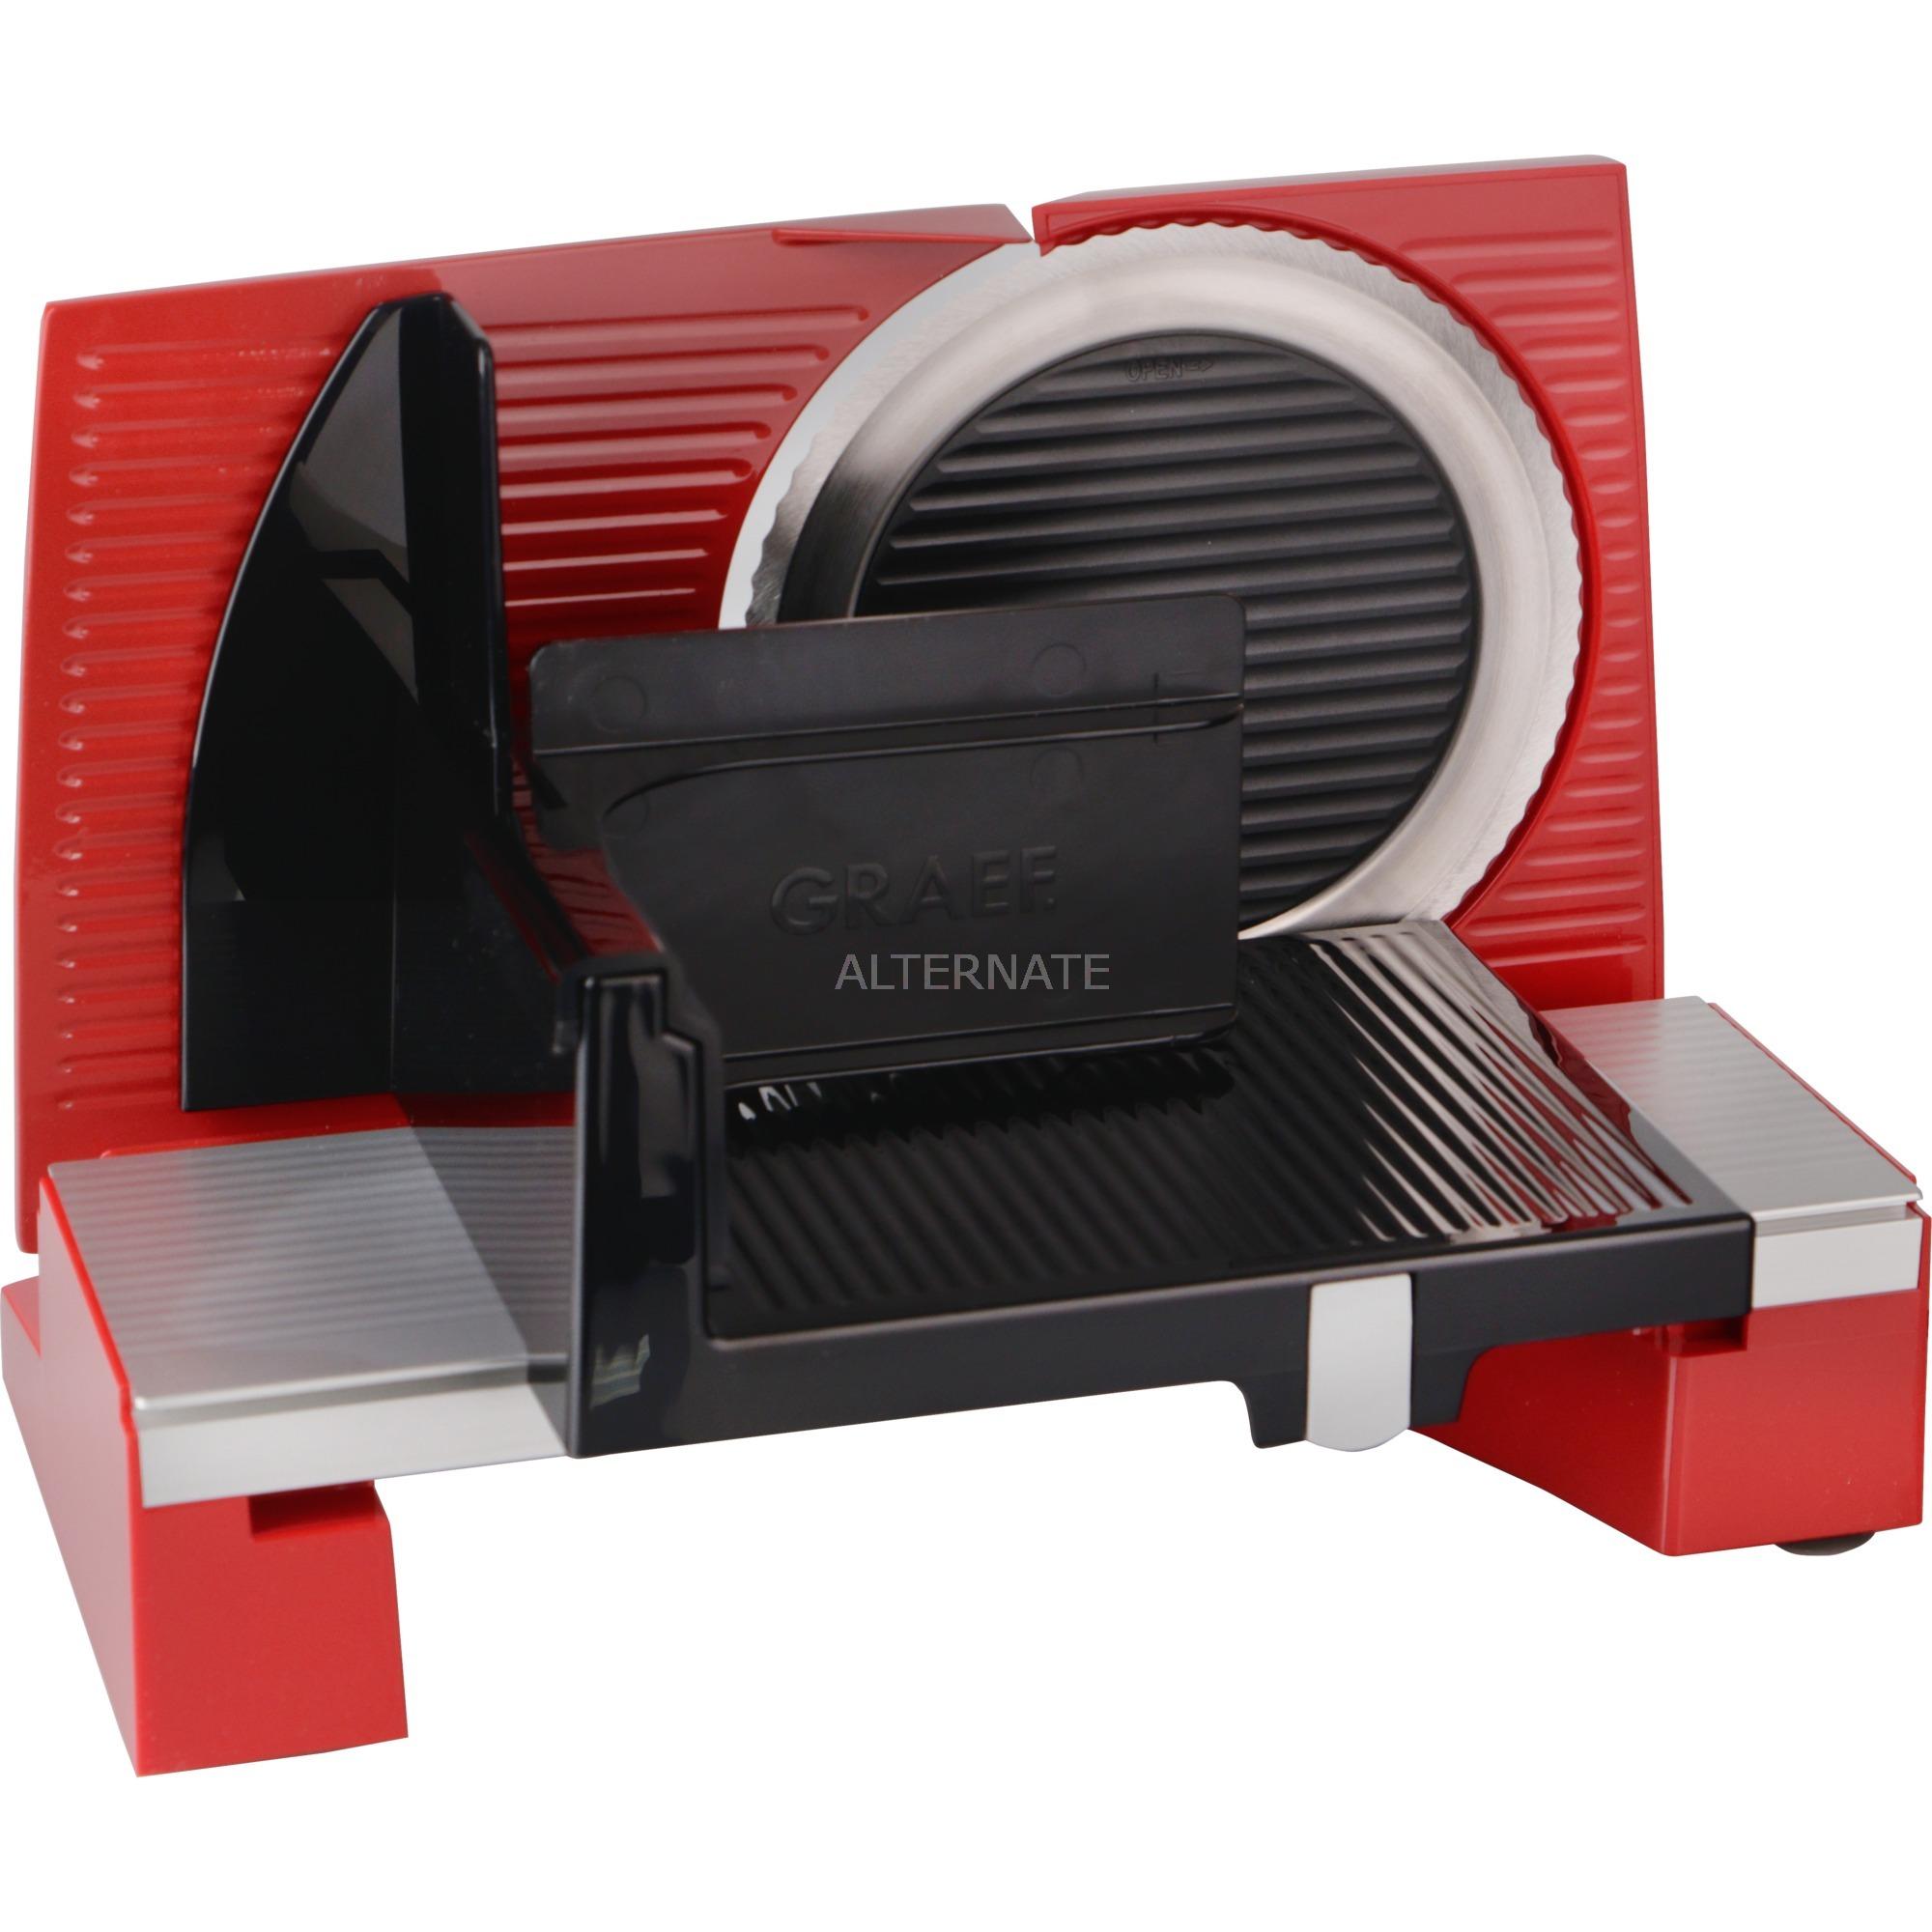 S 10003 Eléctrico 170W Aluminio Rojo rebanadora, Cortatodo